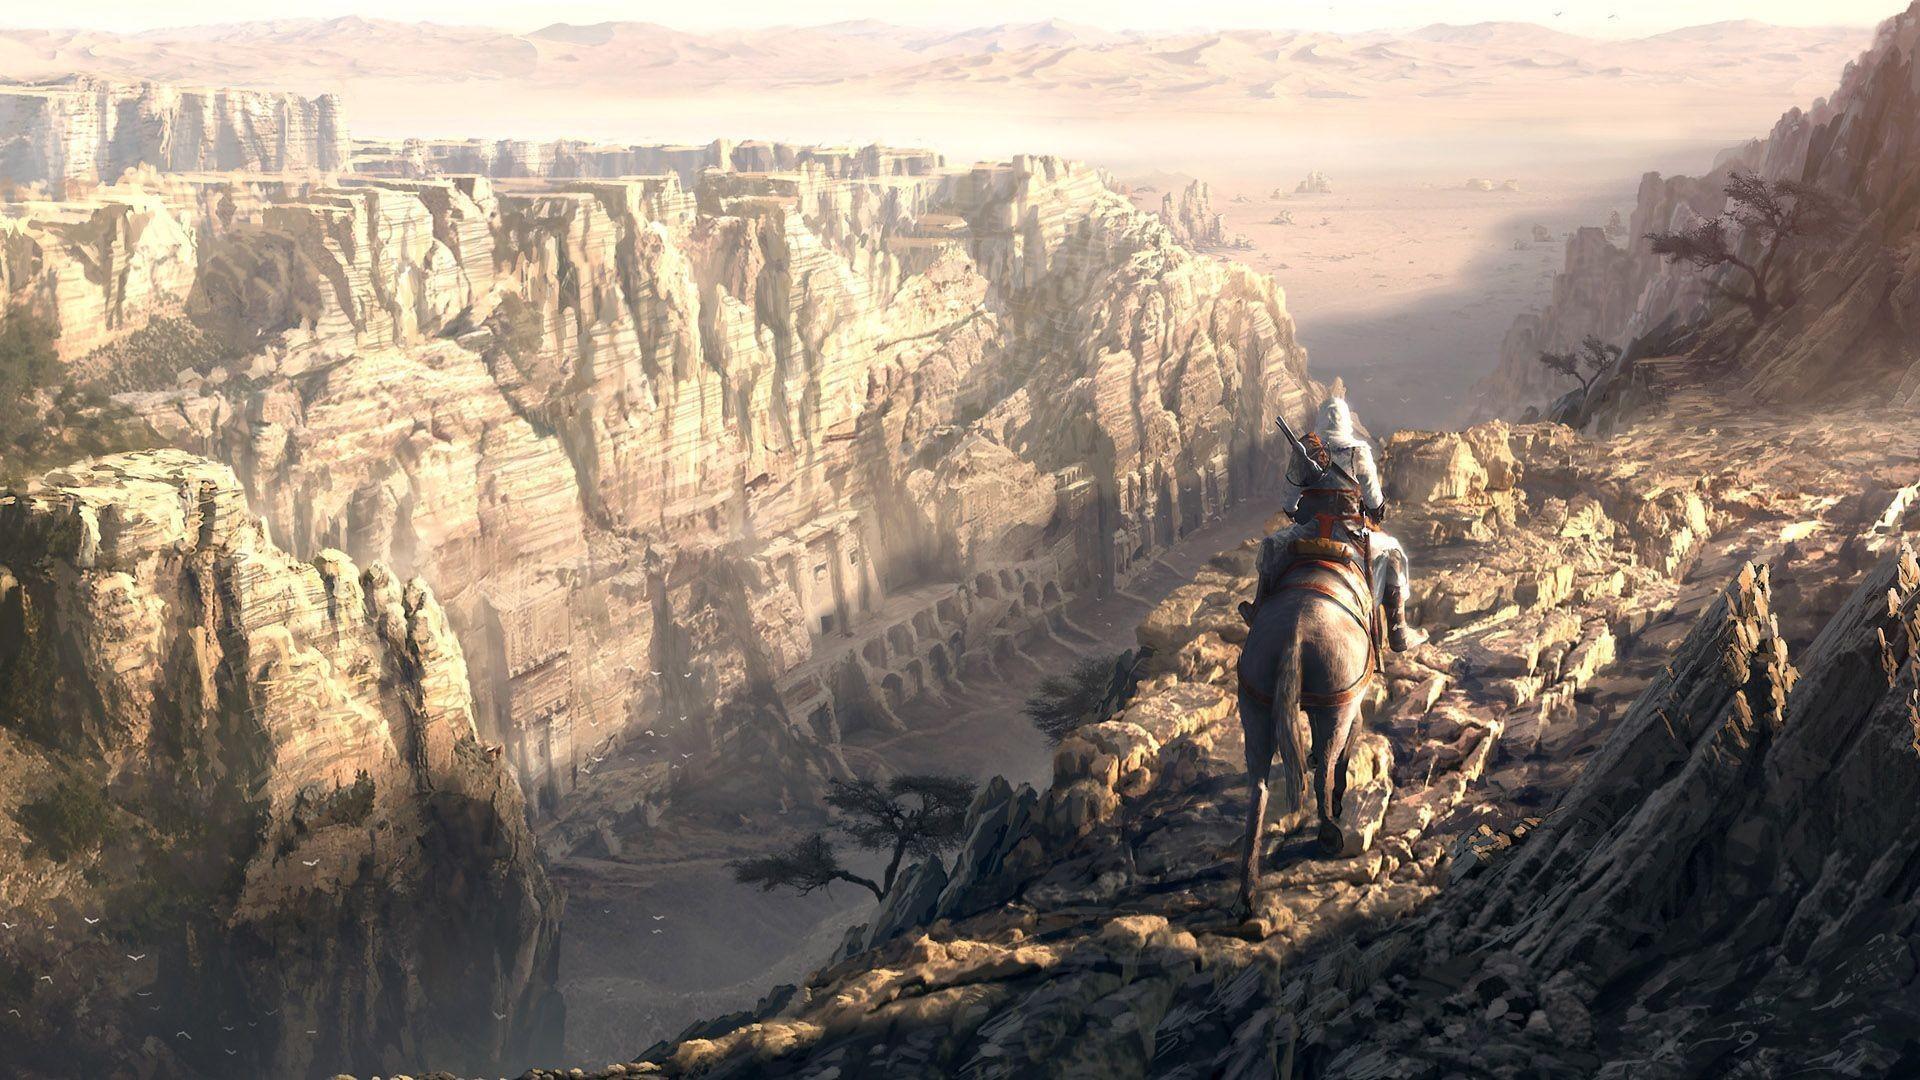 … free download videogame videogames full hd wallpaper download …